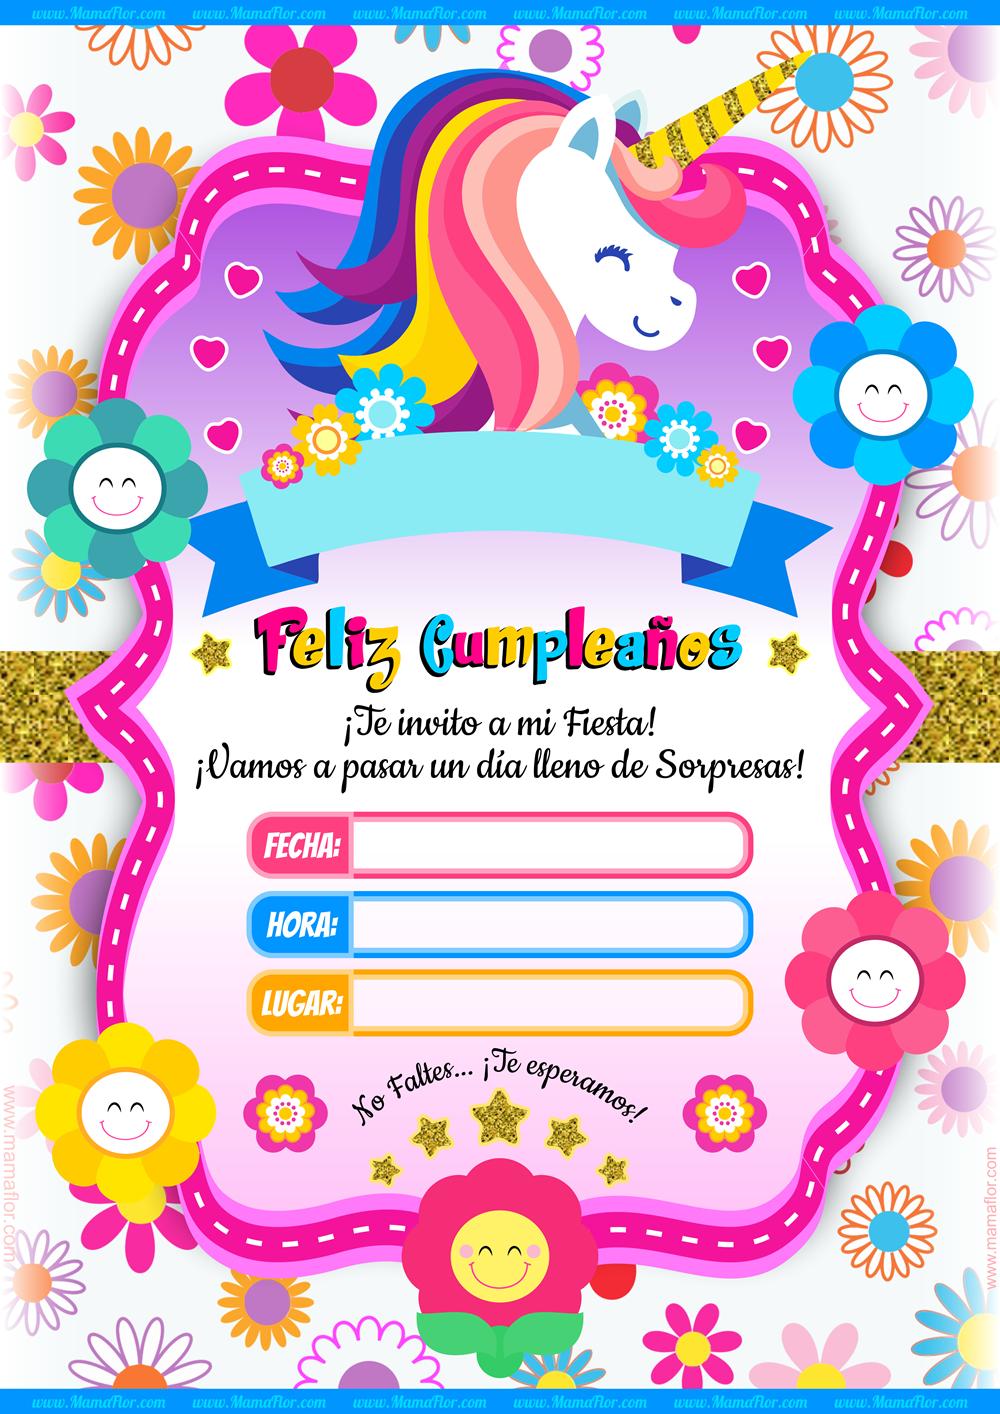 Molde Invitaciones de Unicornio Fiesta Ideas Gratis Imprimir